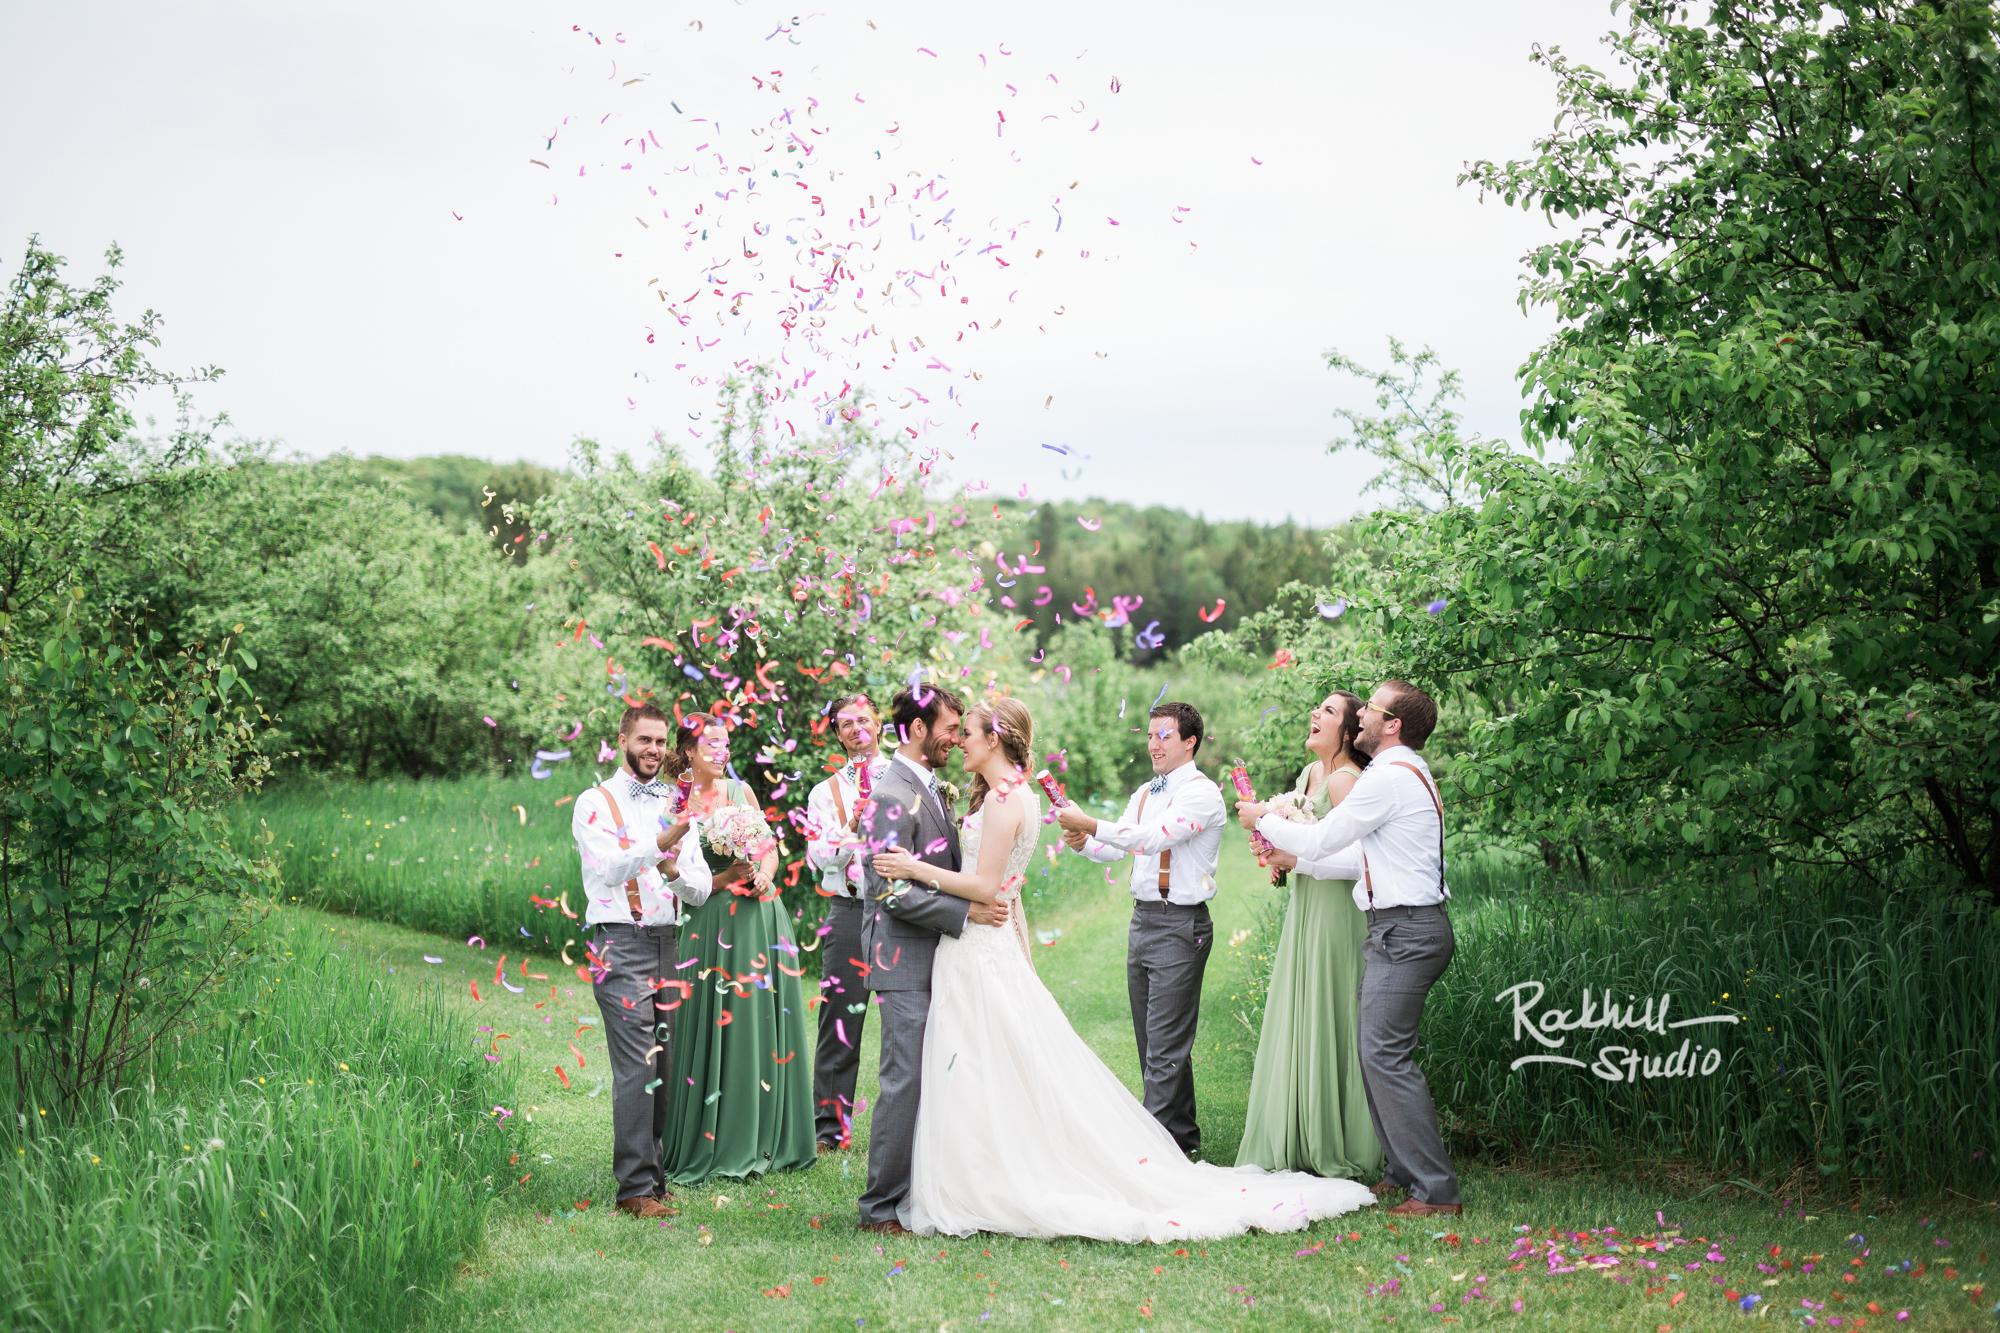 marquette-michigan-wedding-upper-peninsula-confetti-canon-photography-rockhill-ee-34.jpg